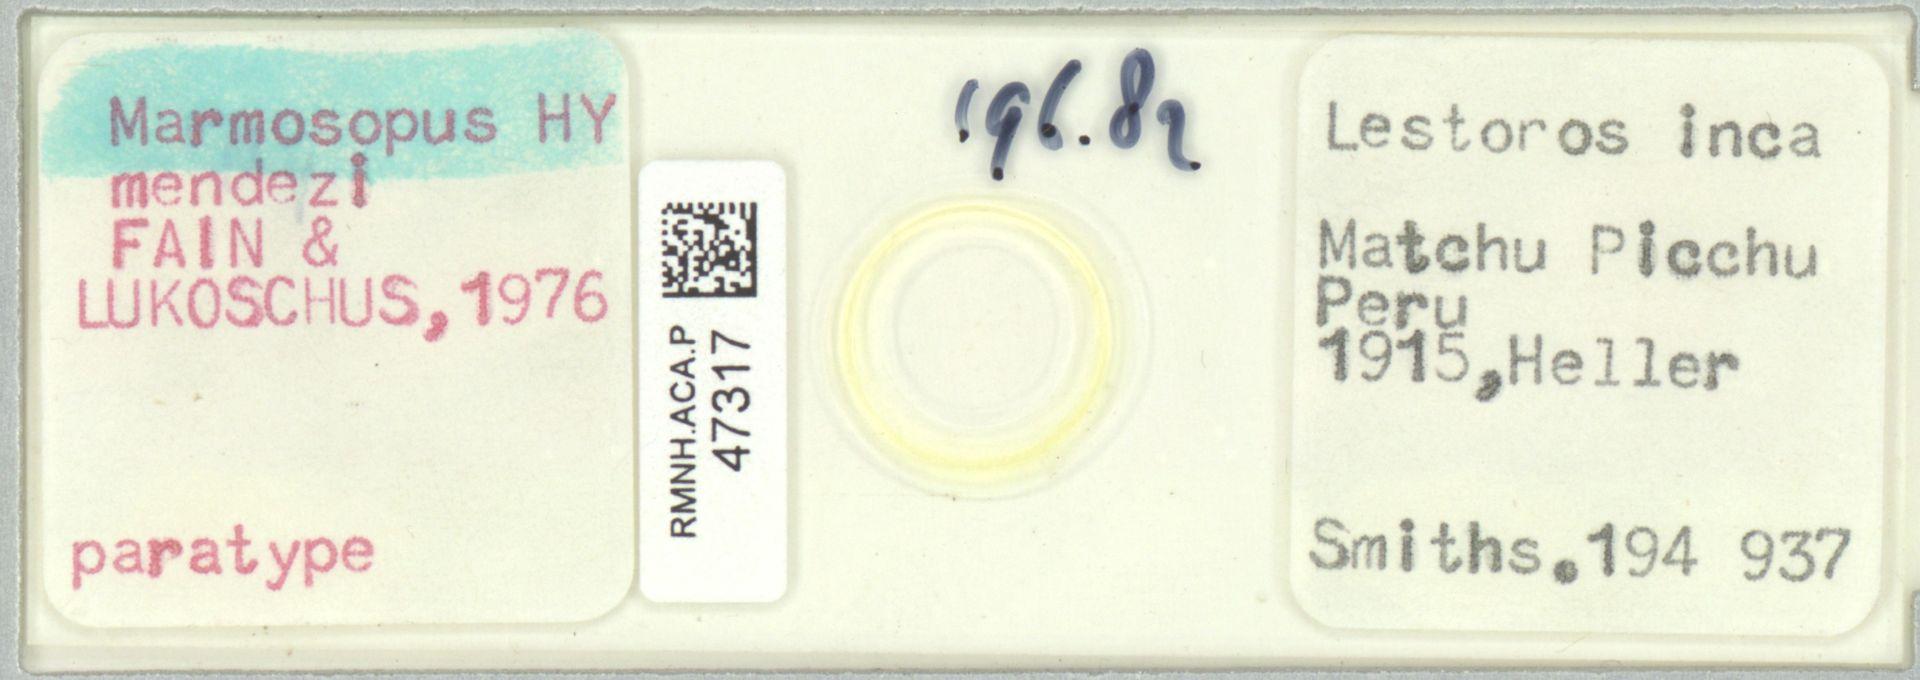 RMNH.ACA.P.47317   Marmosopus mendezi Fain & Lukoschus,1976